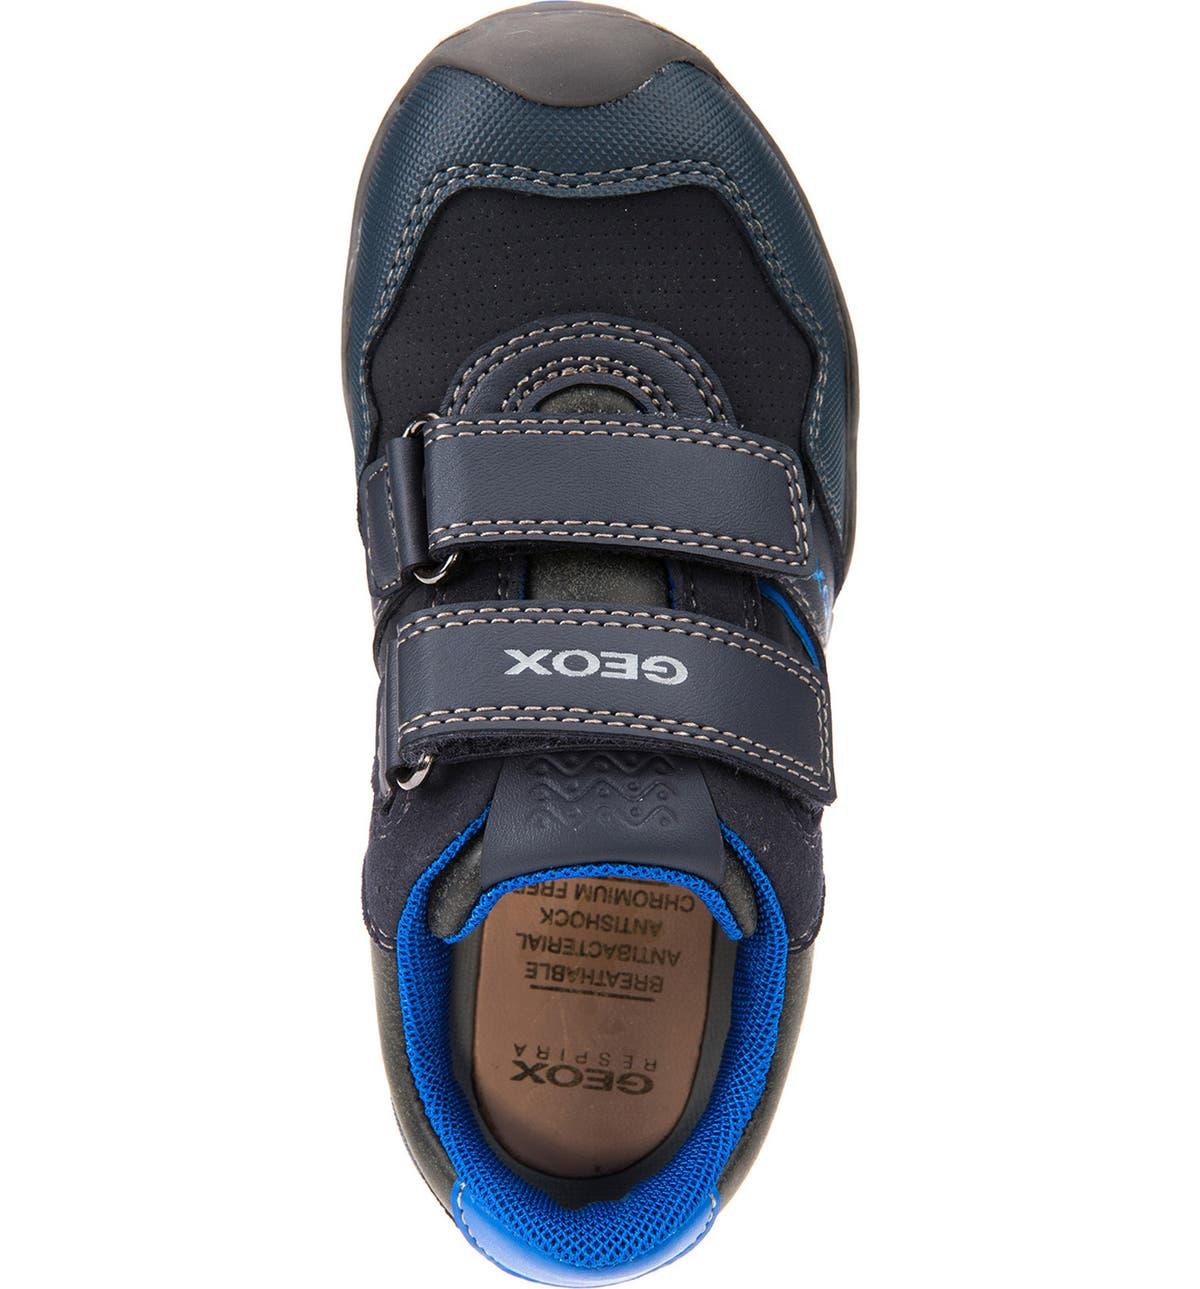 e7b0268b9c Geox Jr Arno 13 Waterproof Sneaker (Toddler, Little Kid & Big Kid) |  Nordstrom